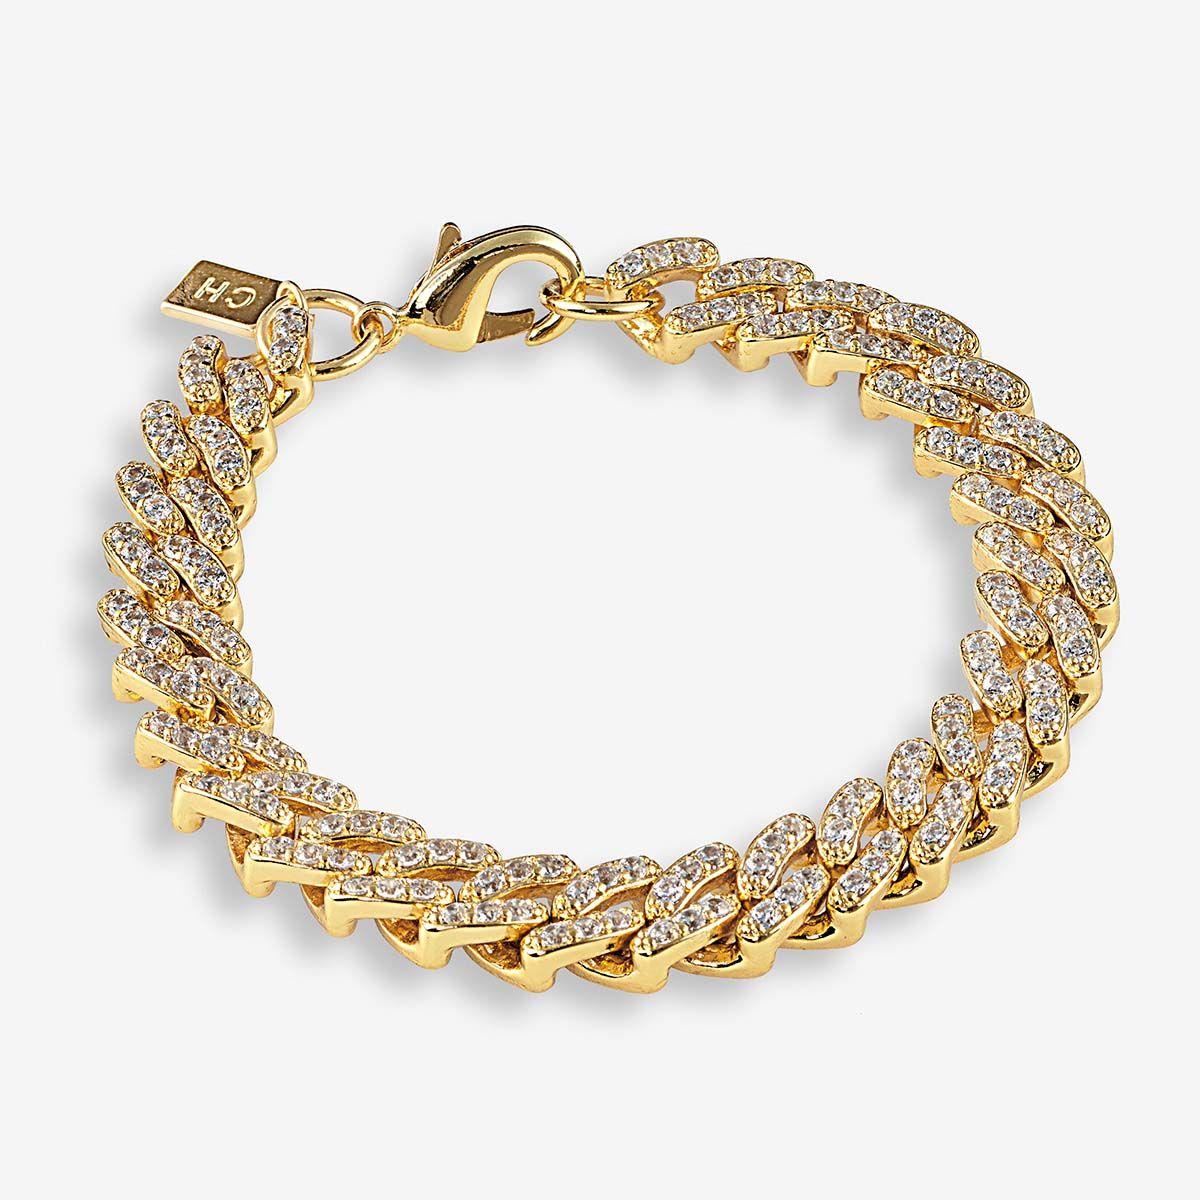 Mexican Bracelet - Armband - 18k vergoldet